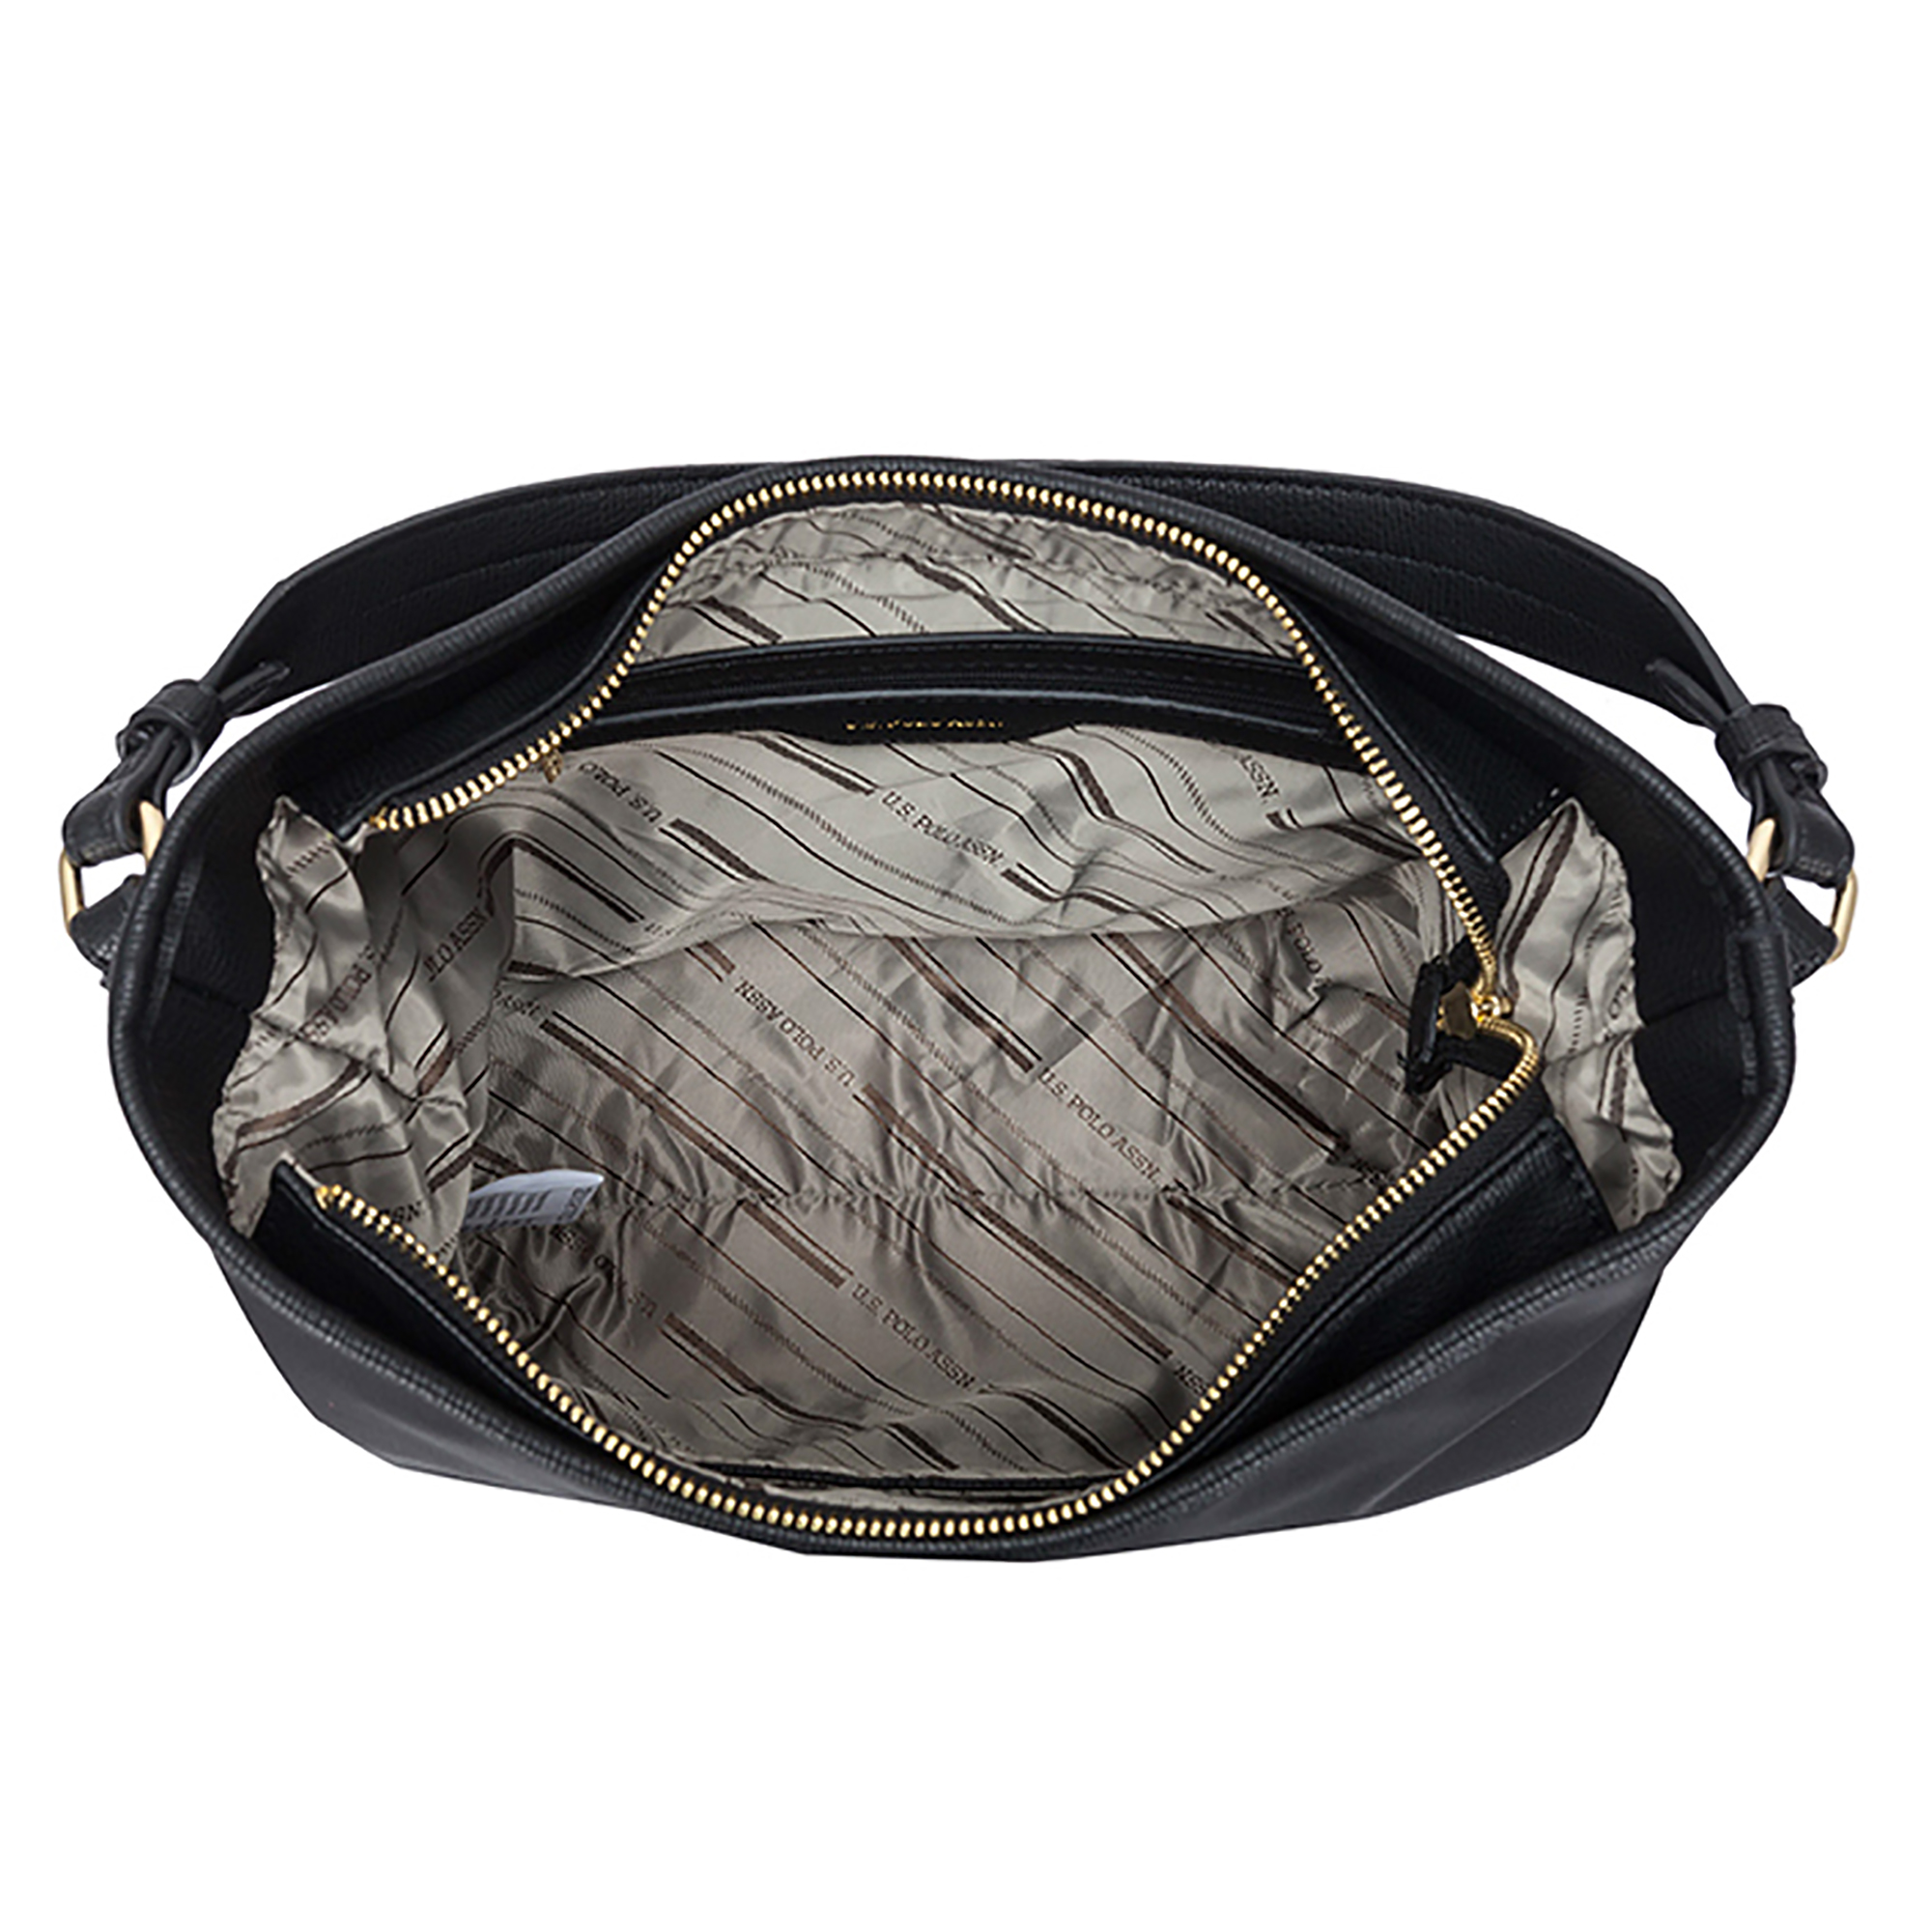 NEW-US-Polo-Assn-Houston-Hobo-Zip-Top-Handbag-Casual-Fashion-Nylon-Single-Strap thumbnail 6